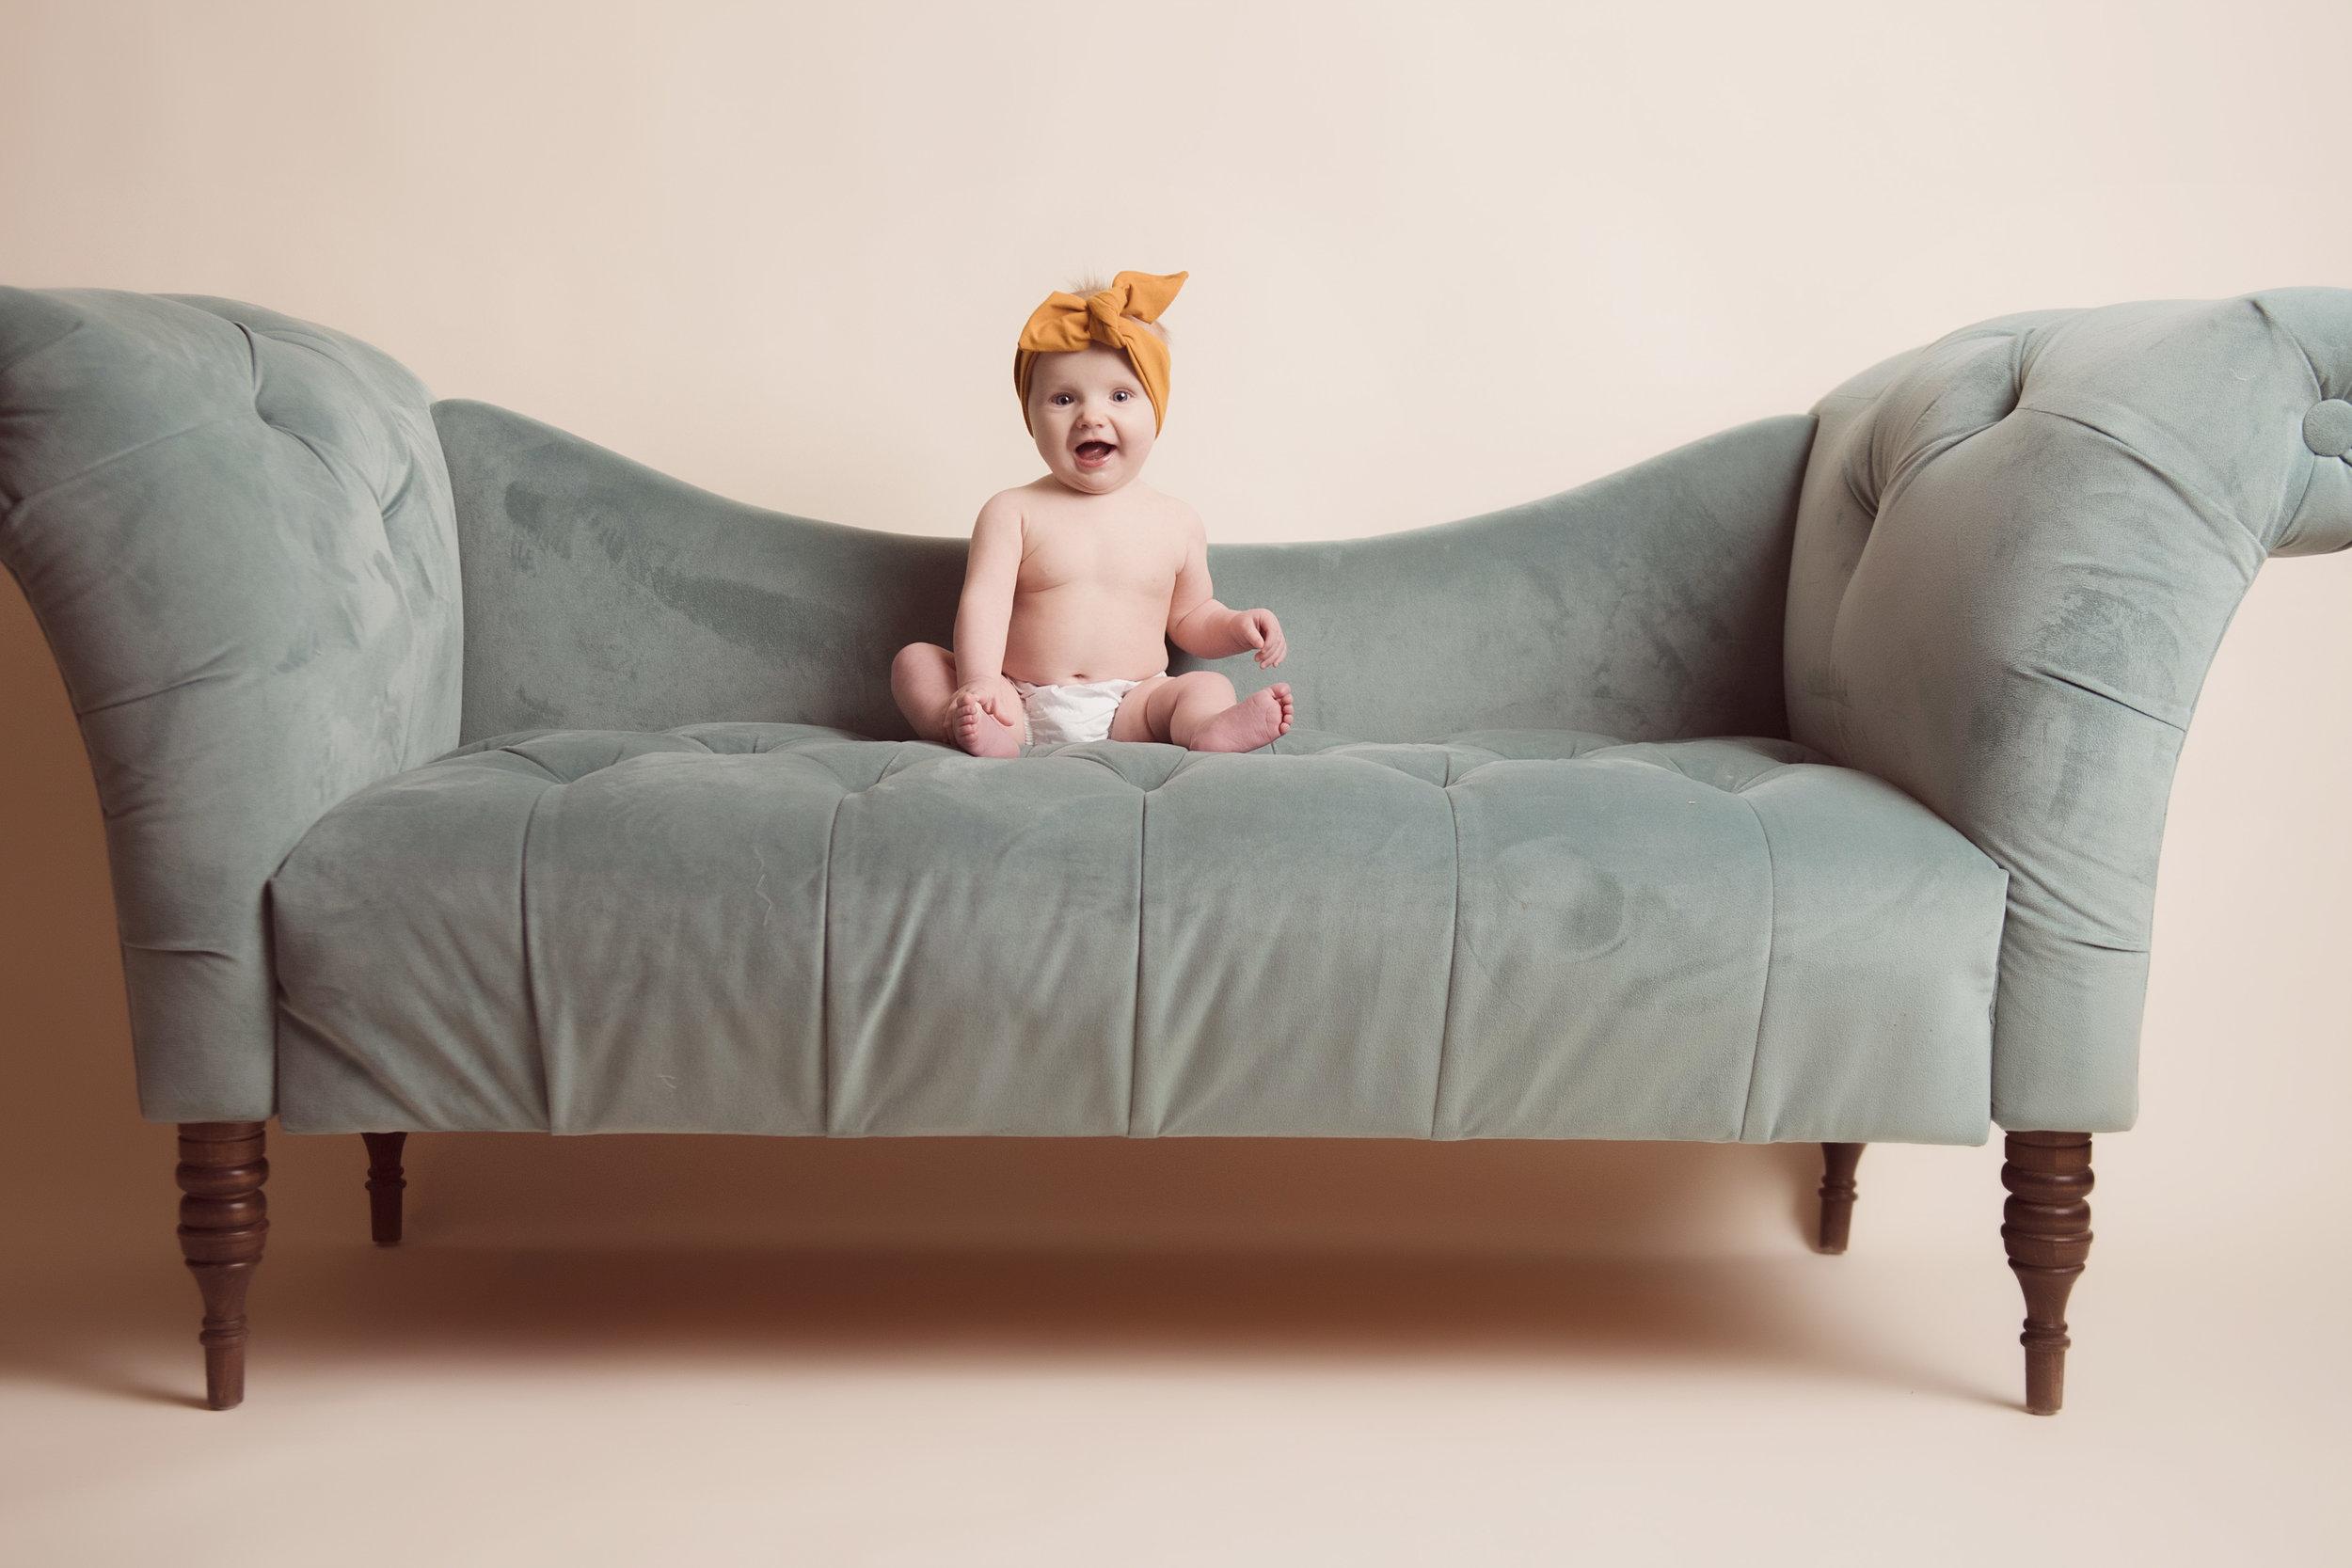 Bozeman-Billings-Montana-Tina-Stinson-Photography-kids-photographer-baby-2-13.jpg